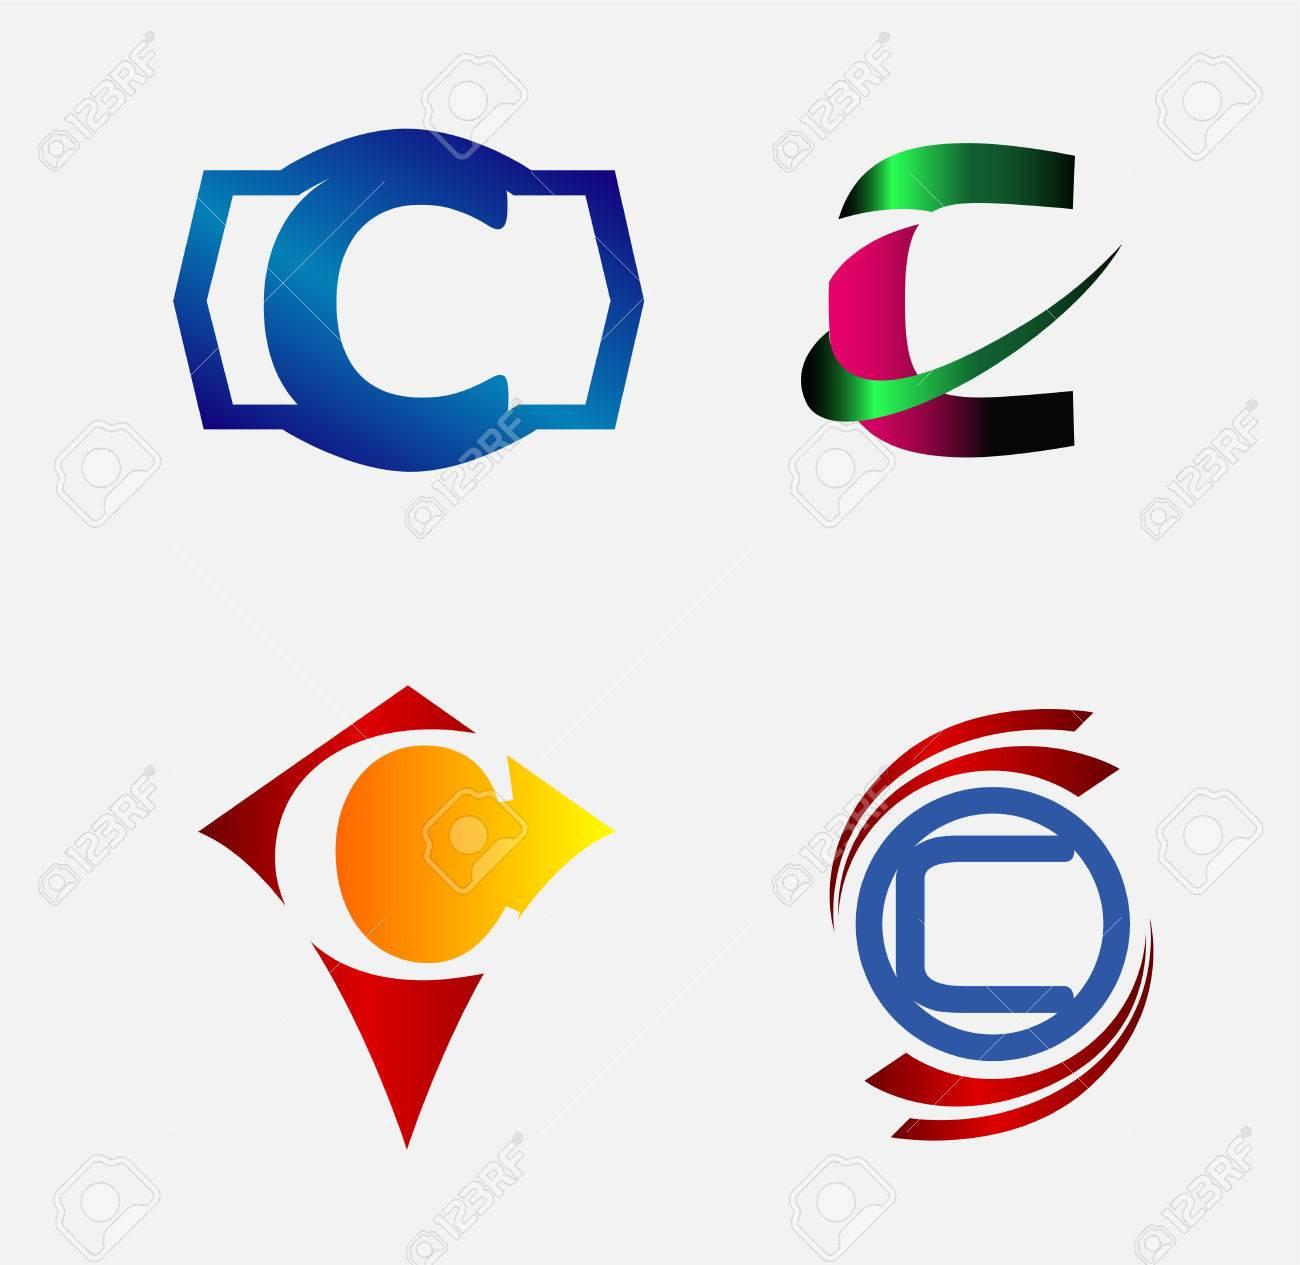 Letter c logo design sample royalty free cliparts vectors and letter c logo design sample stock vector 41288819 spiritdancerdesigns Gallery